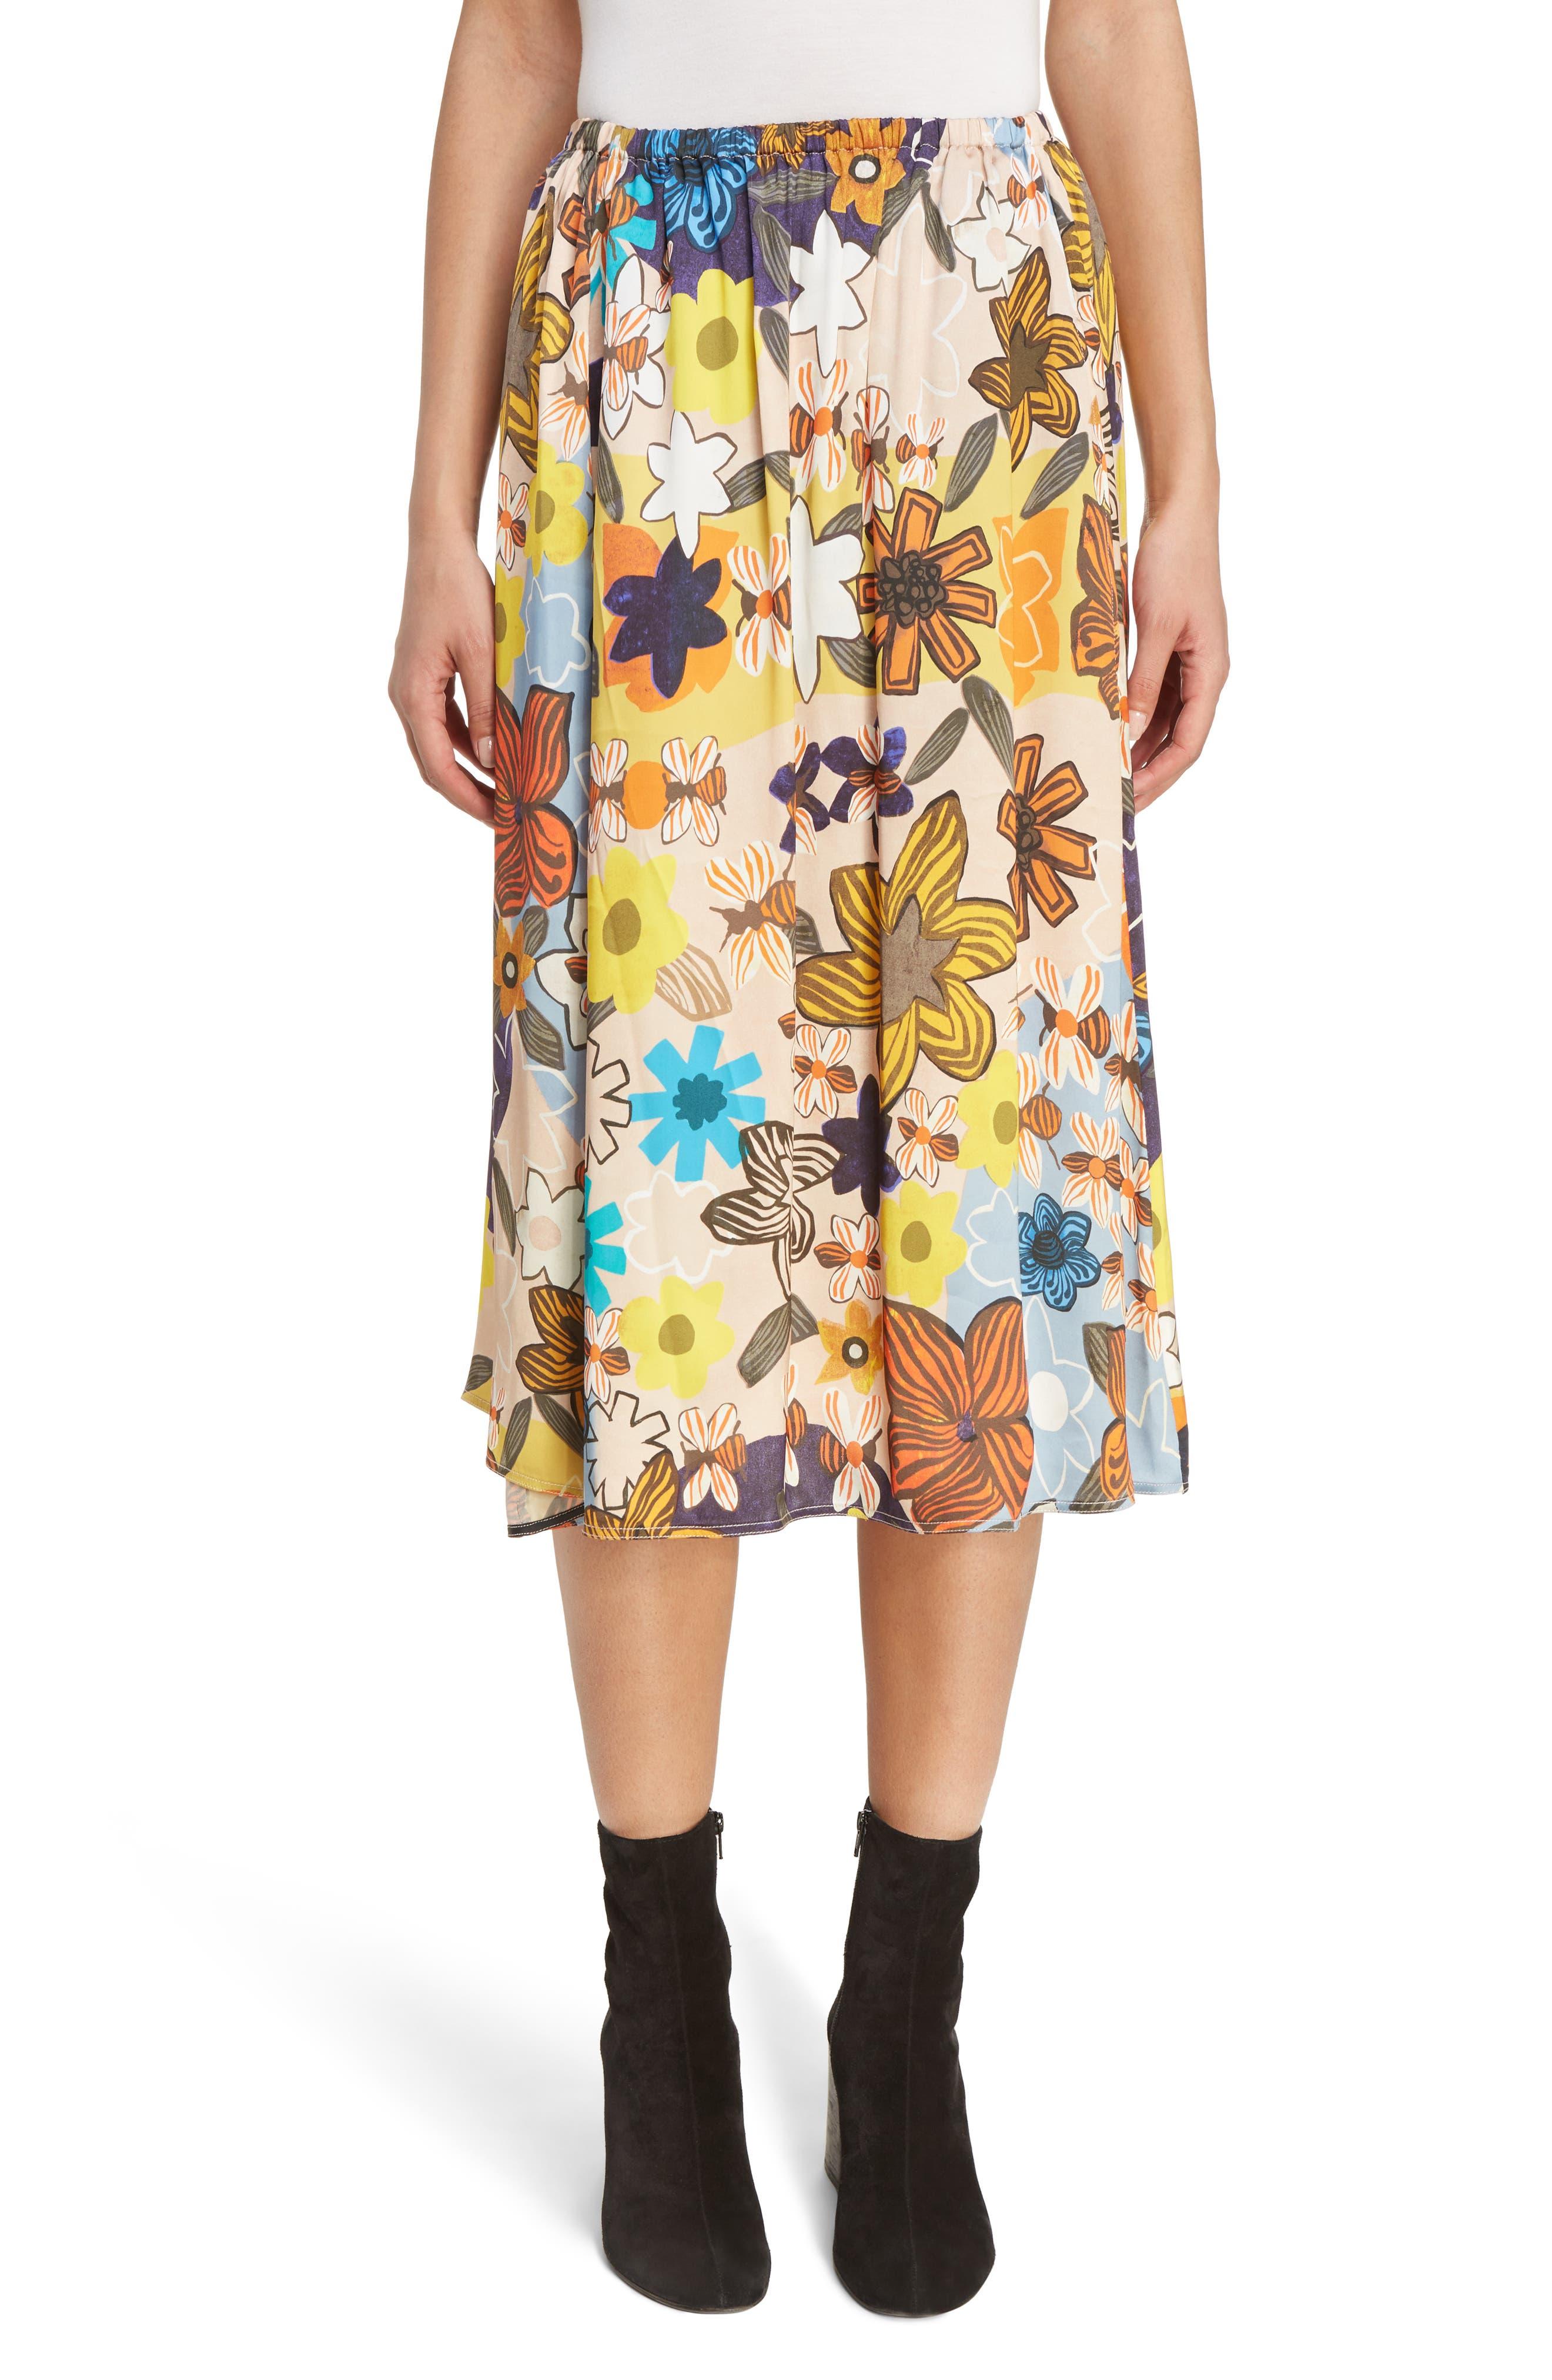 ACNE Studios Sabina Floral Print Midi Skirt